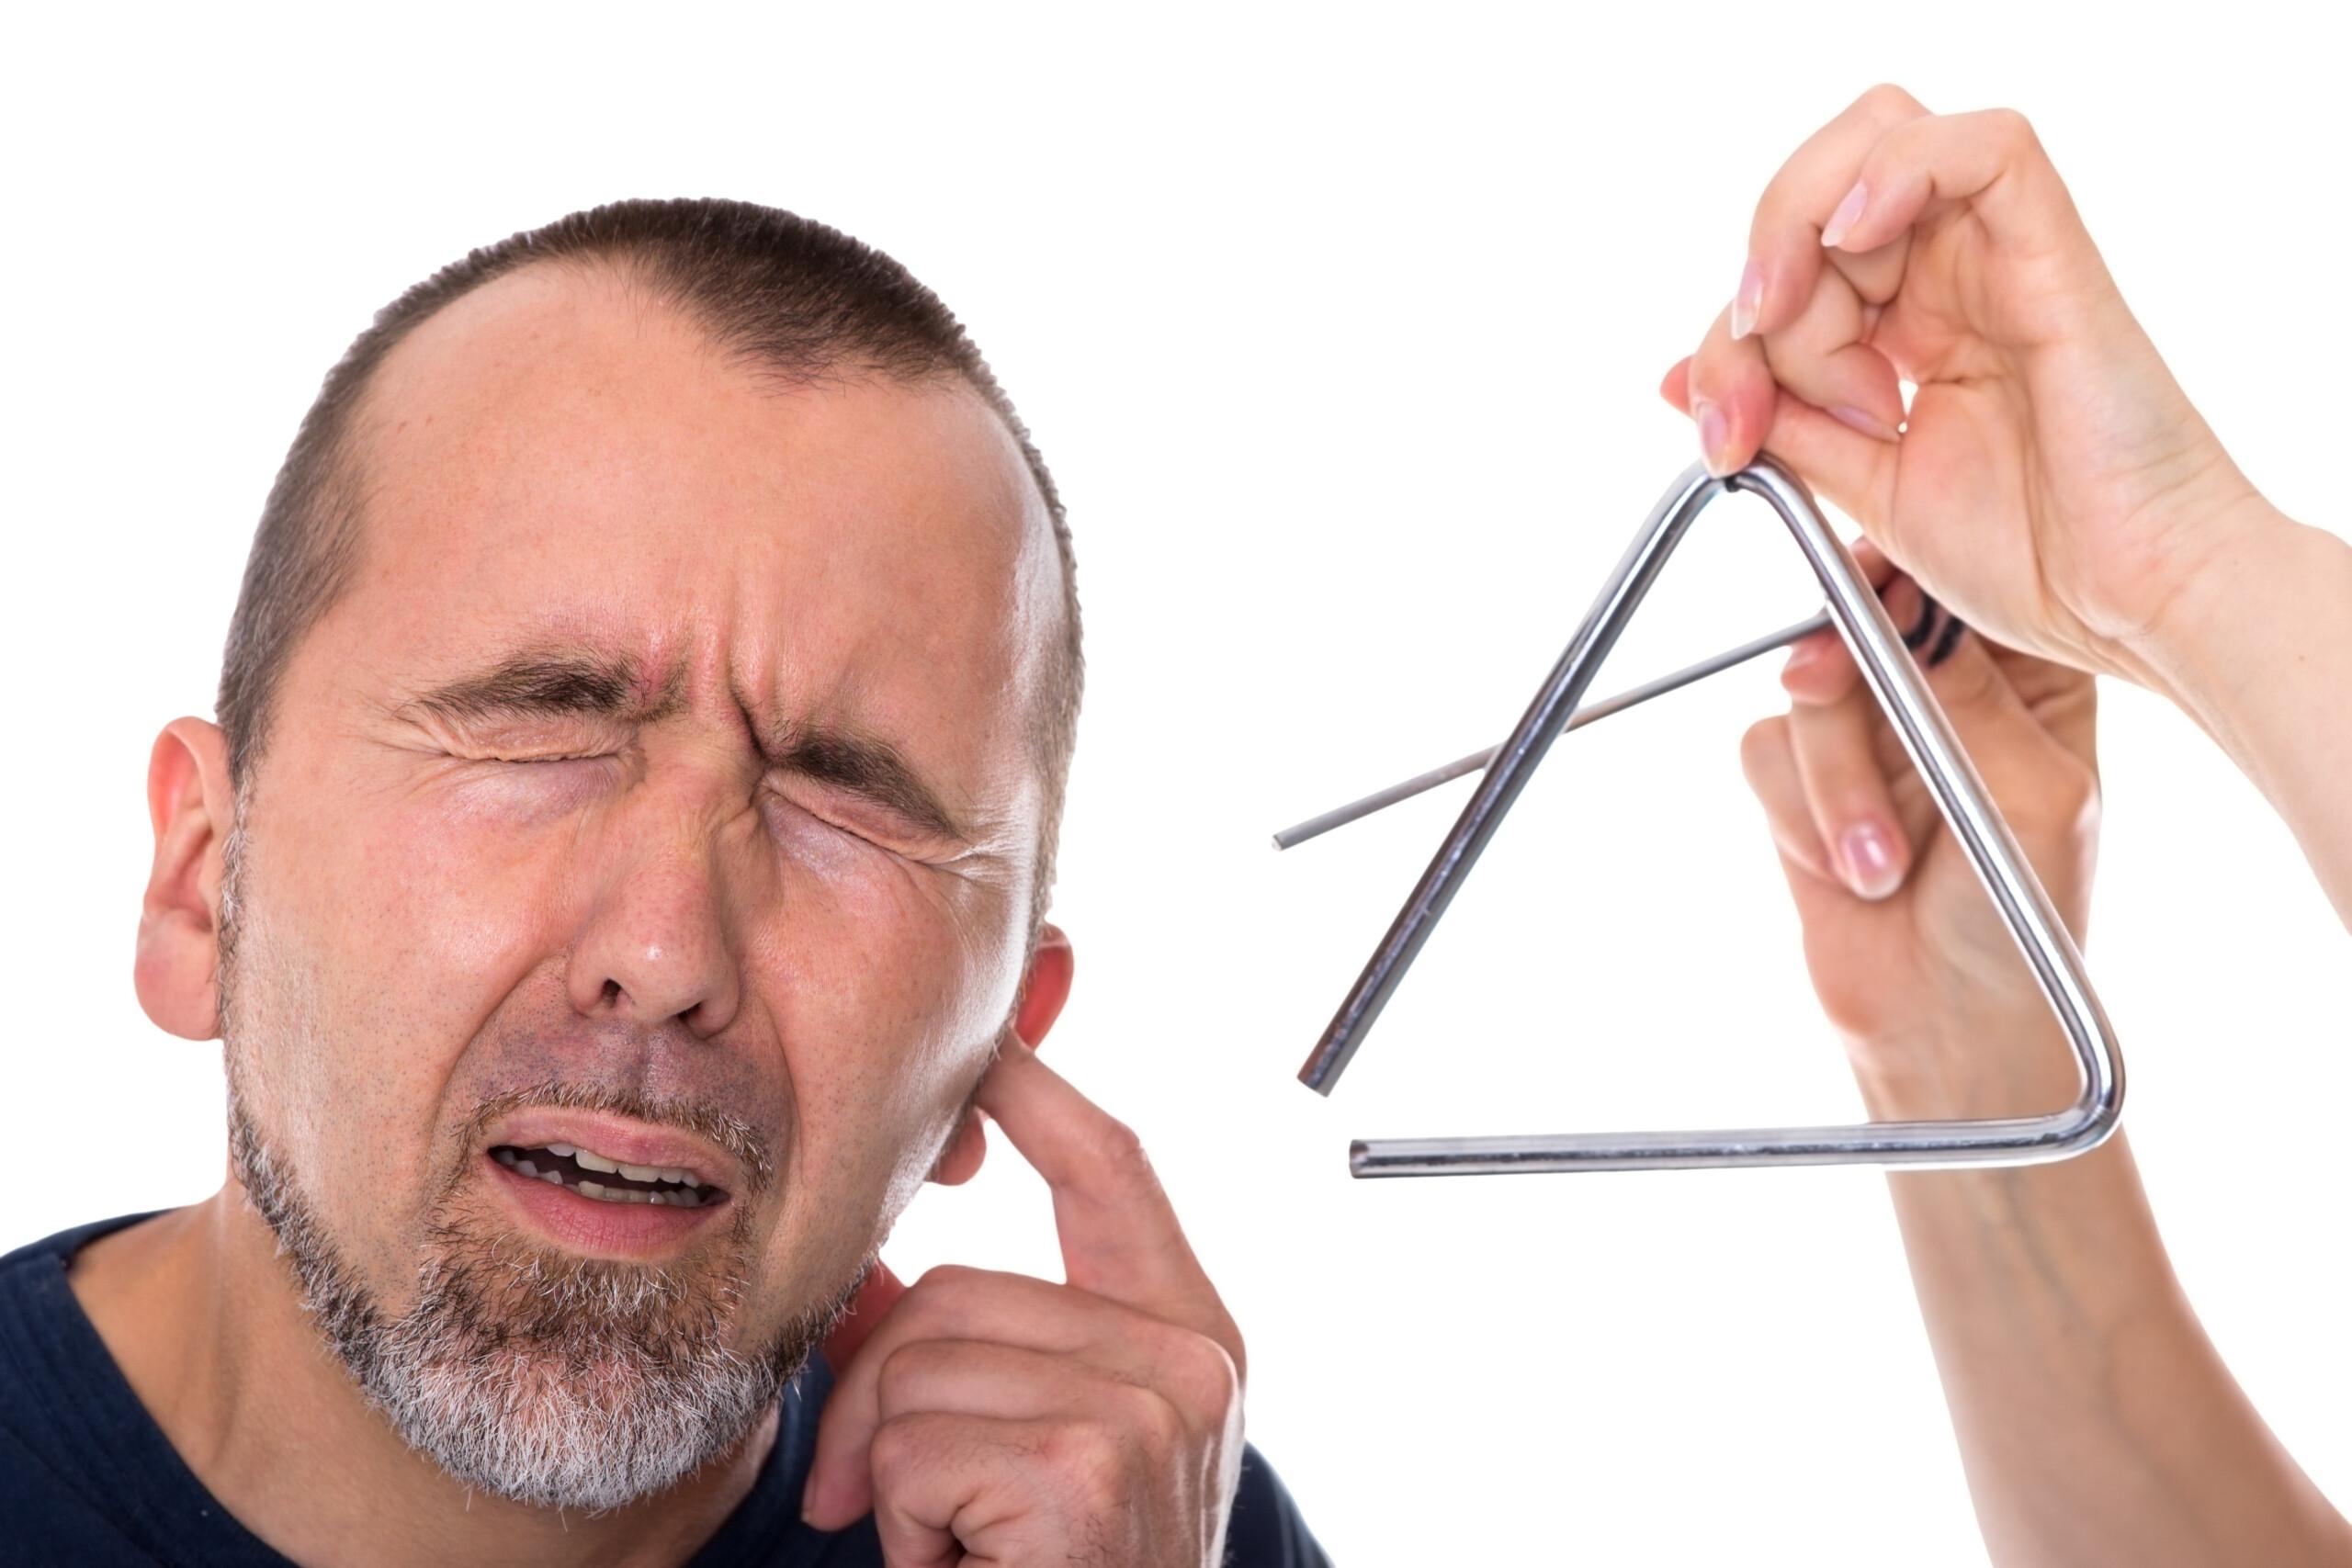 Can TMJ Disorder Treatment Improve Tinnitus?